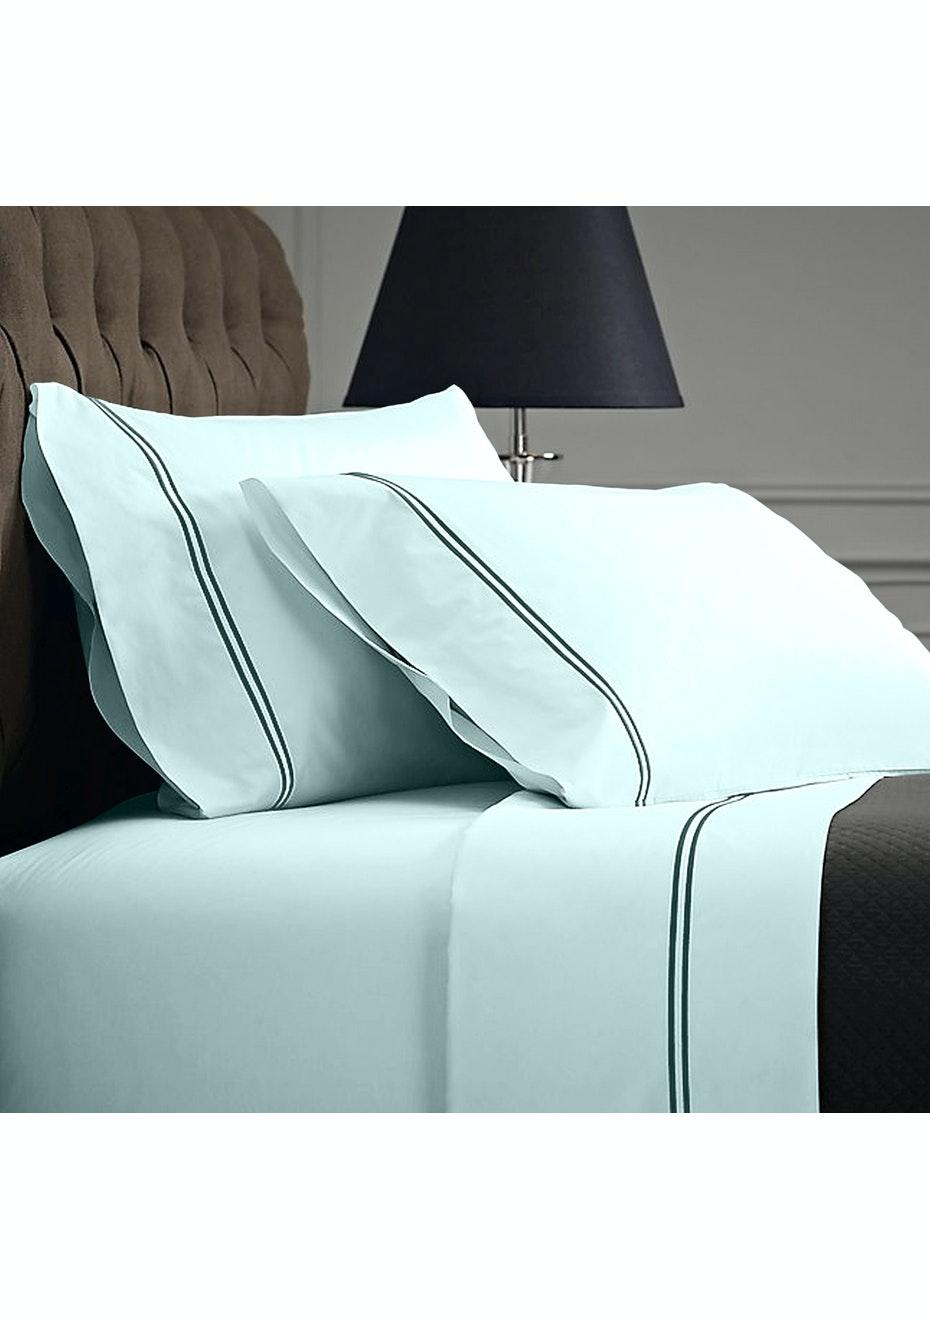 Style & Co 1000 Thread count Egyptian Cotton Hotel Collection Sorrento Sheet sets Mega Queen Duck Egg